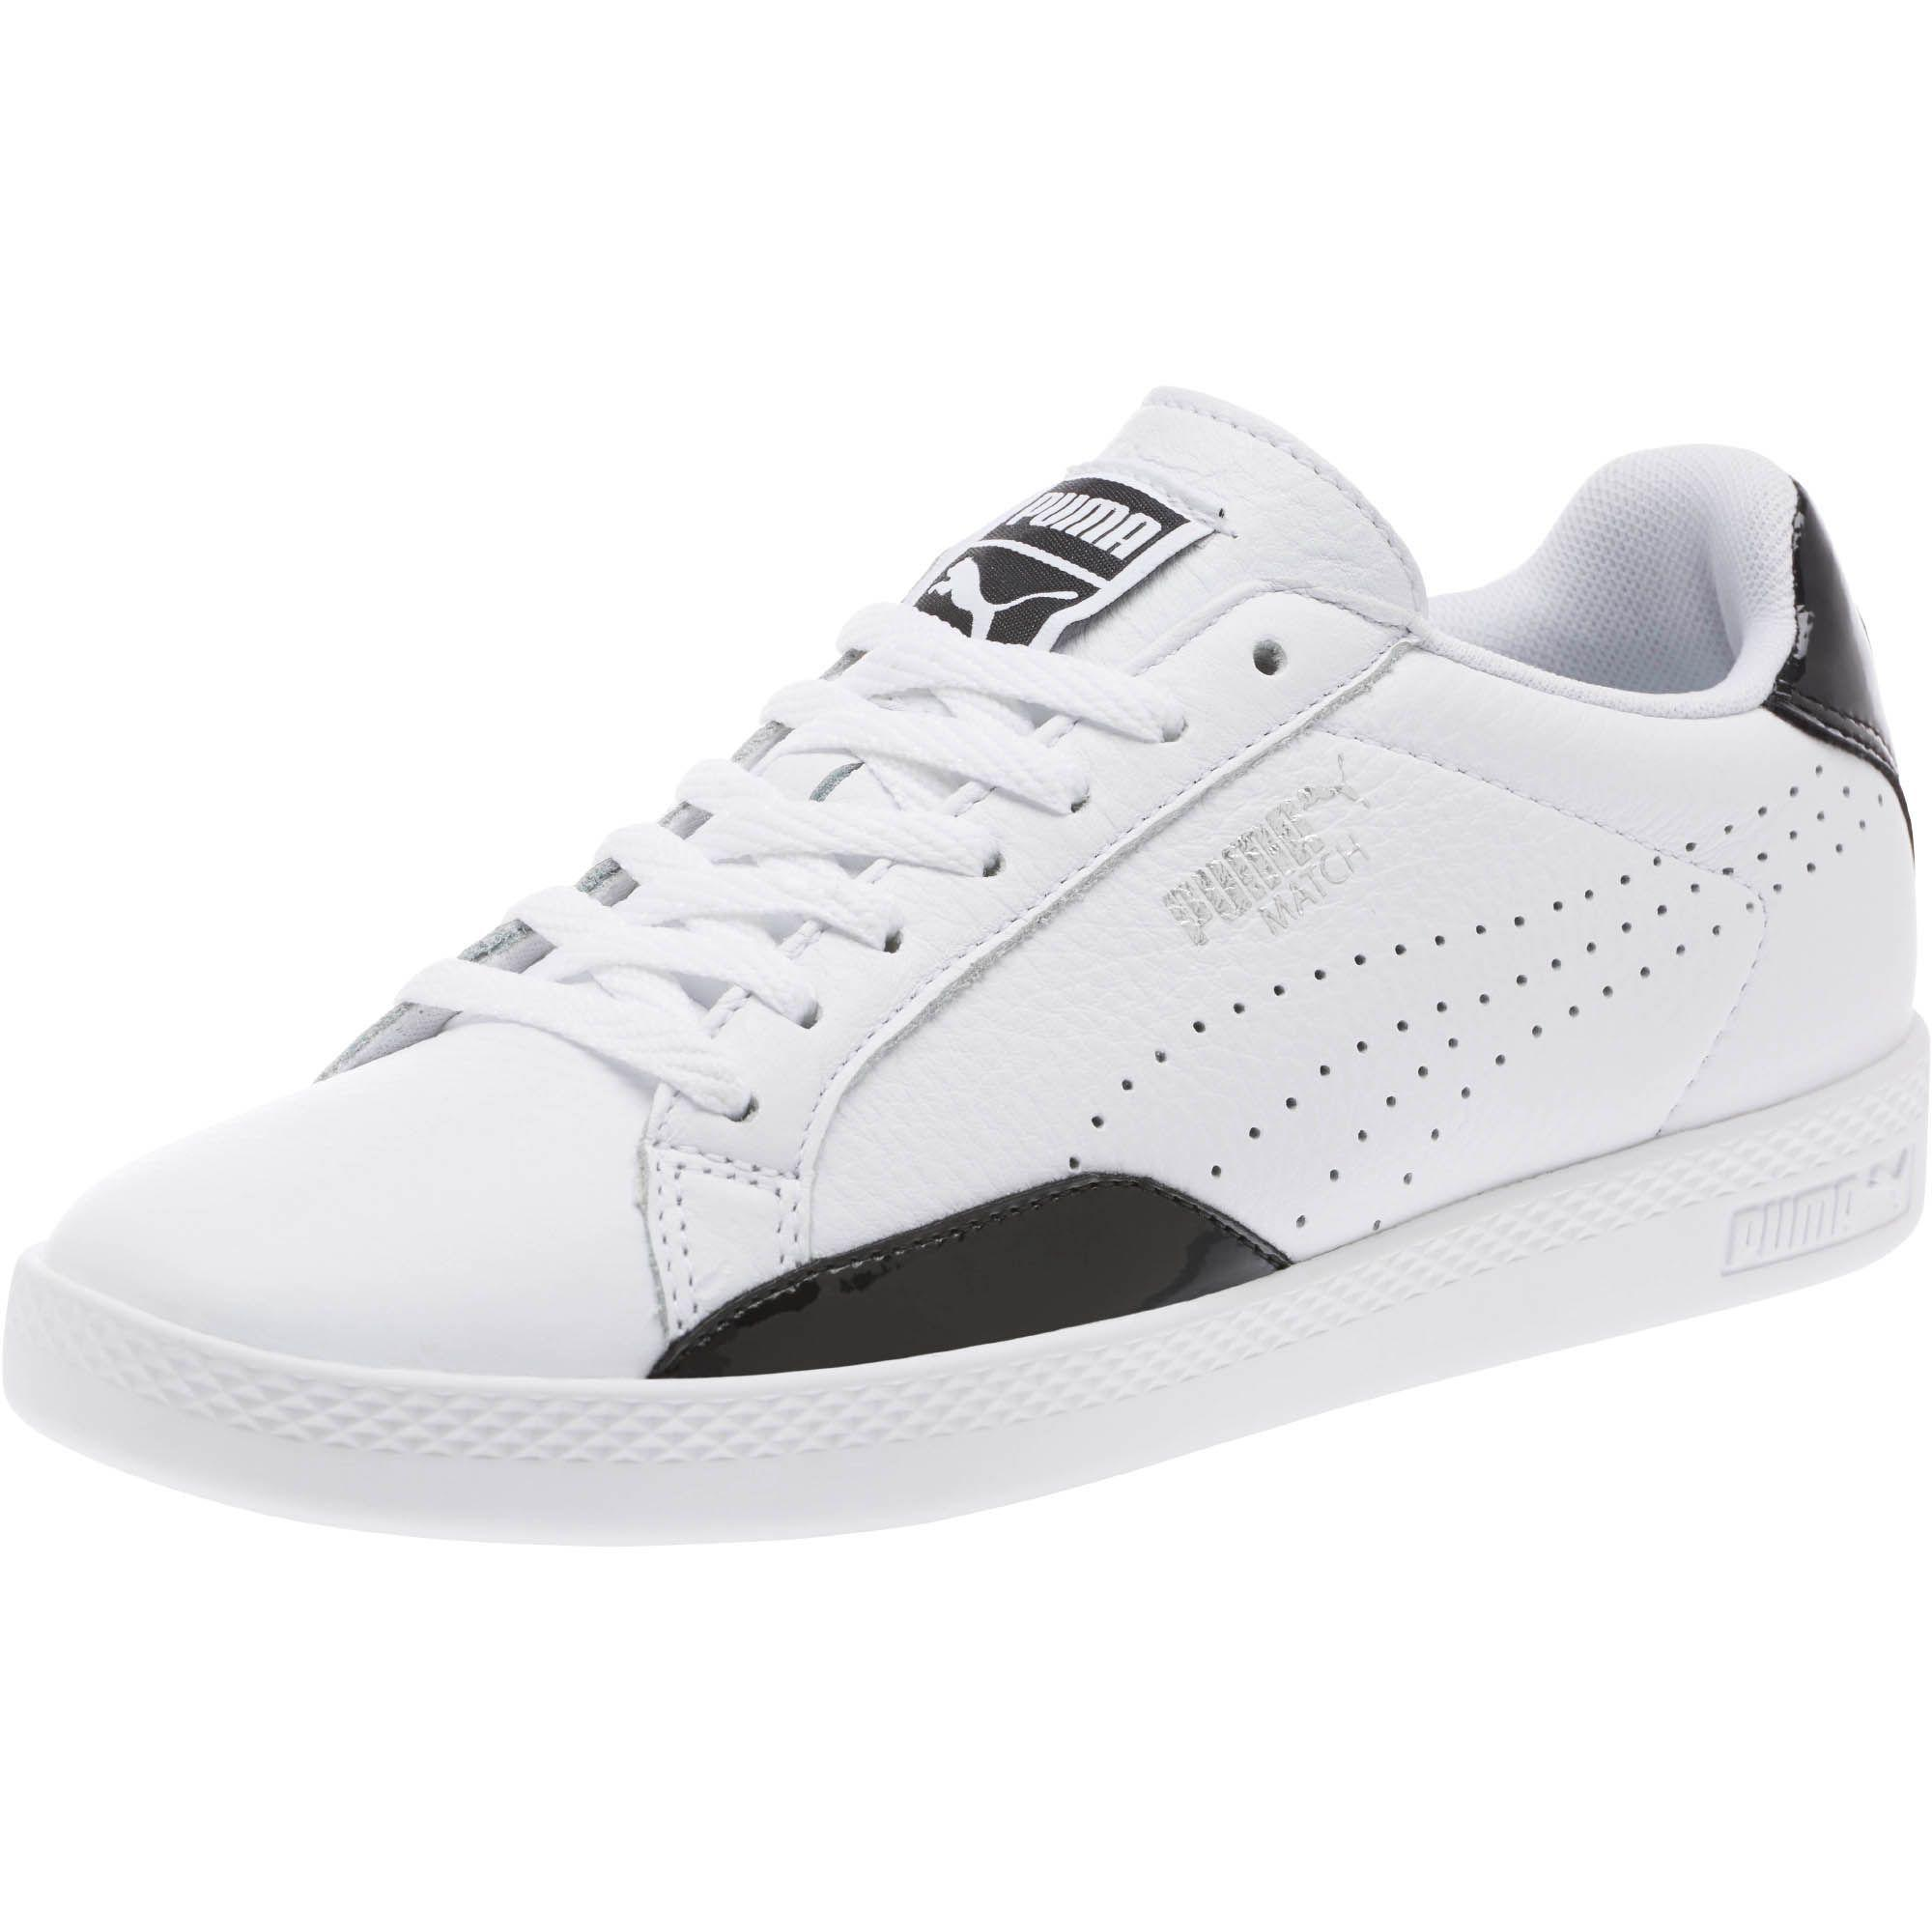 7e1dbbaab34 Lyst - PUMA Match Women s Sneakers in White